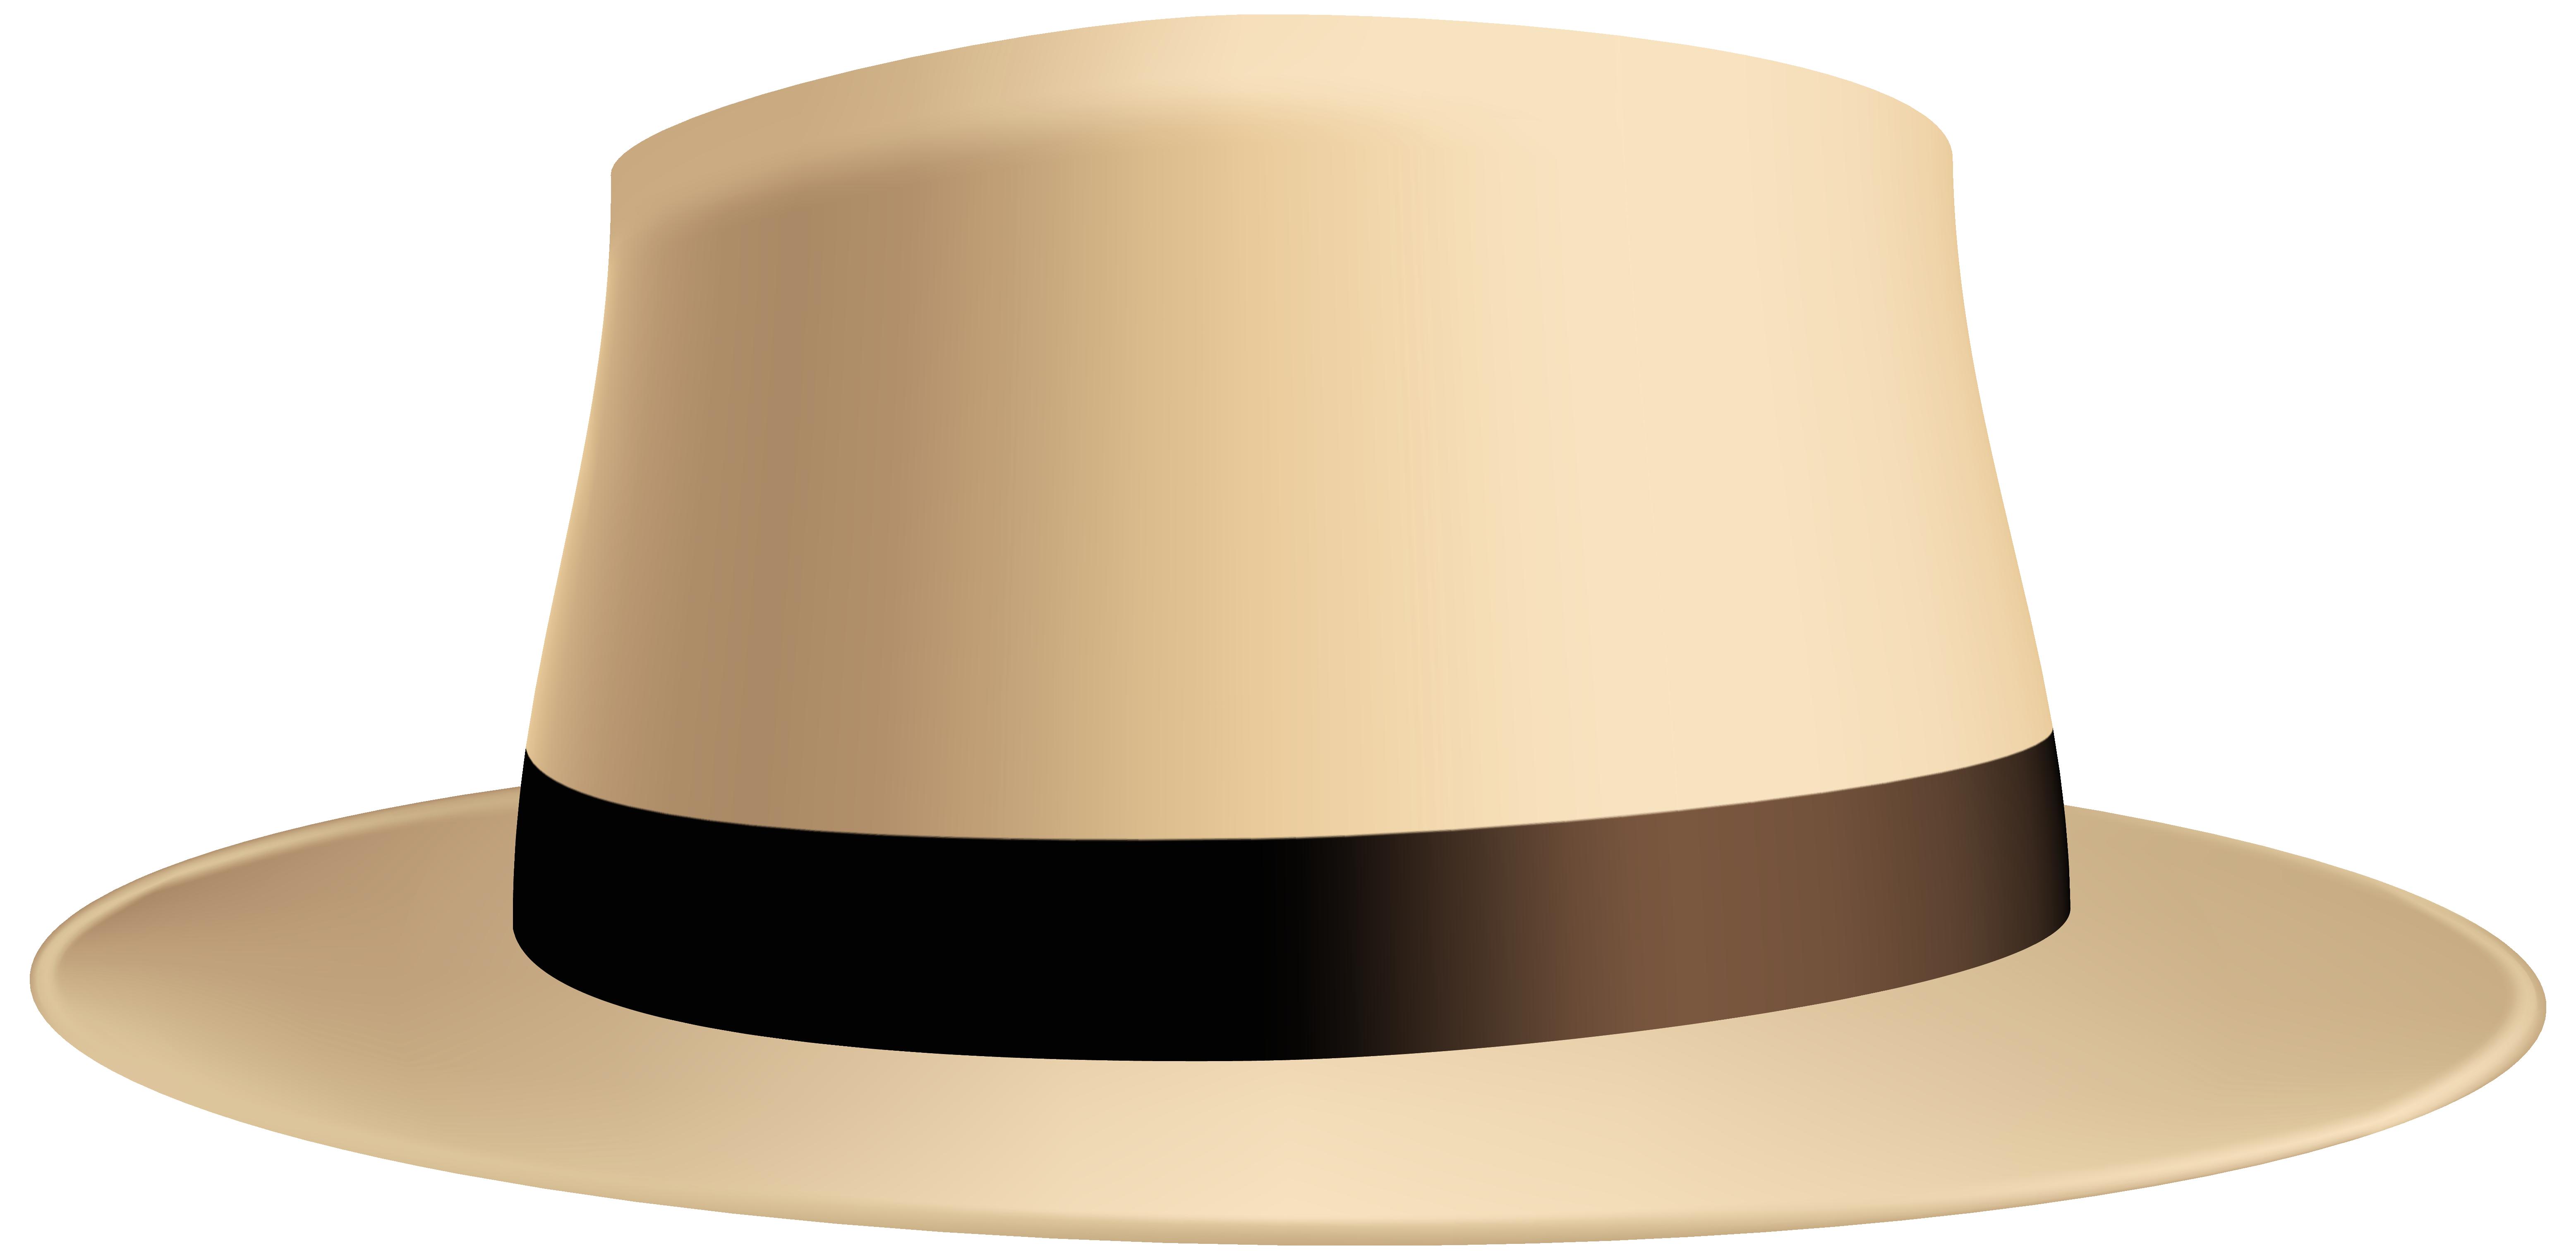 6227x3047 Male Summer Hat Png Clip Art Imageu200b Gallery Yopriceville